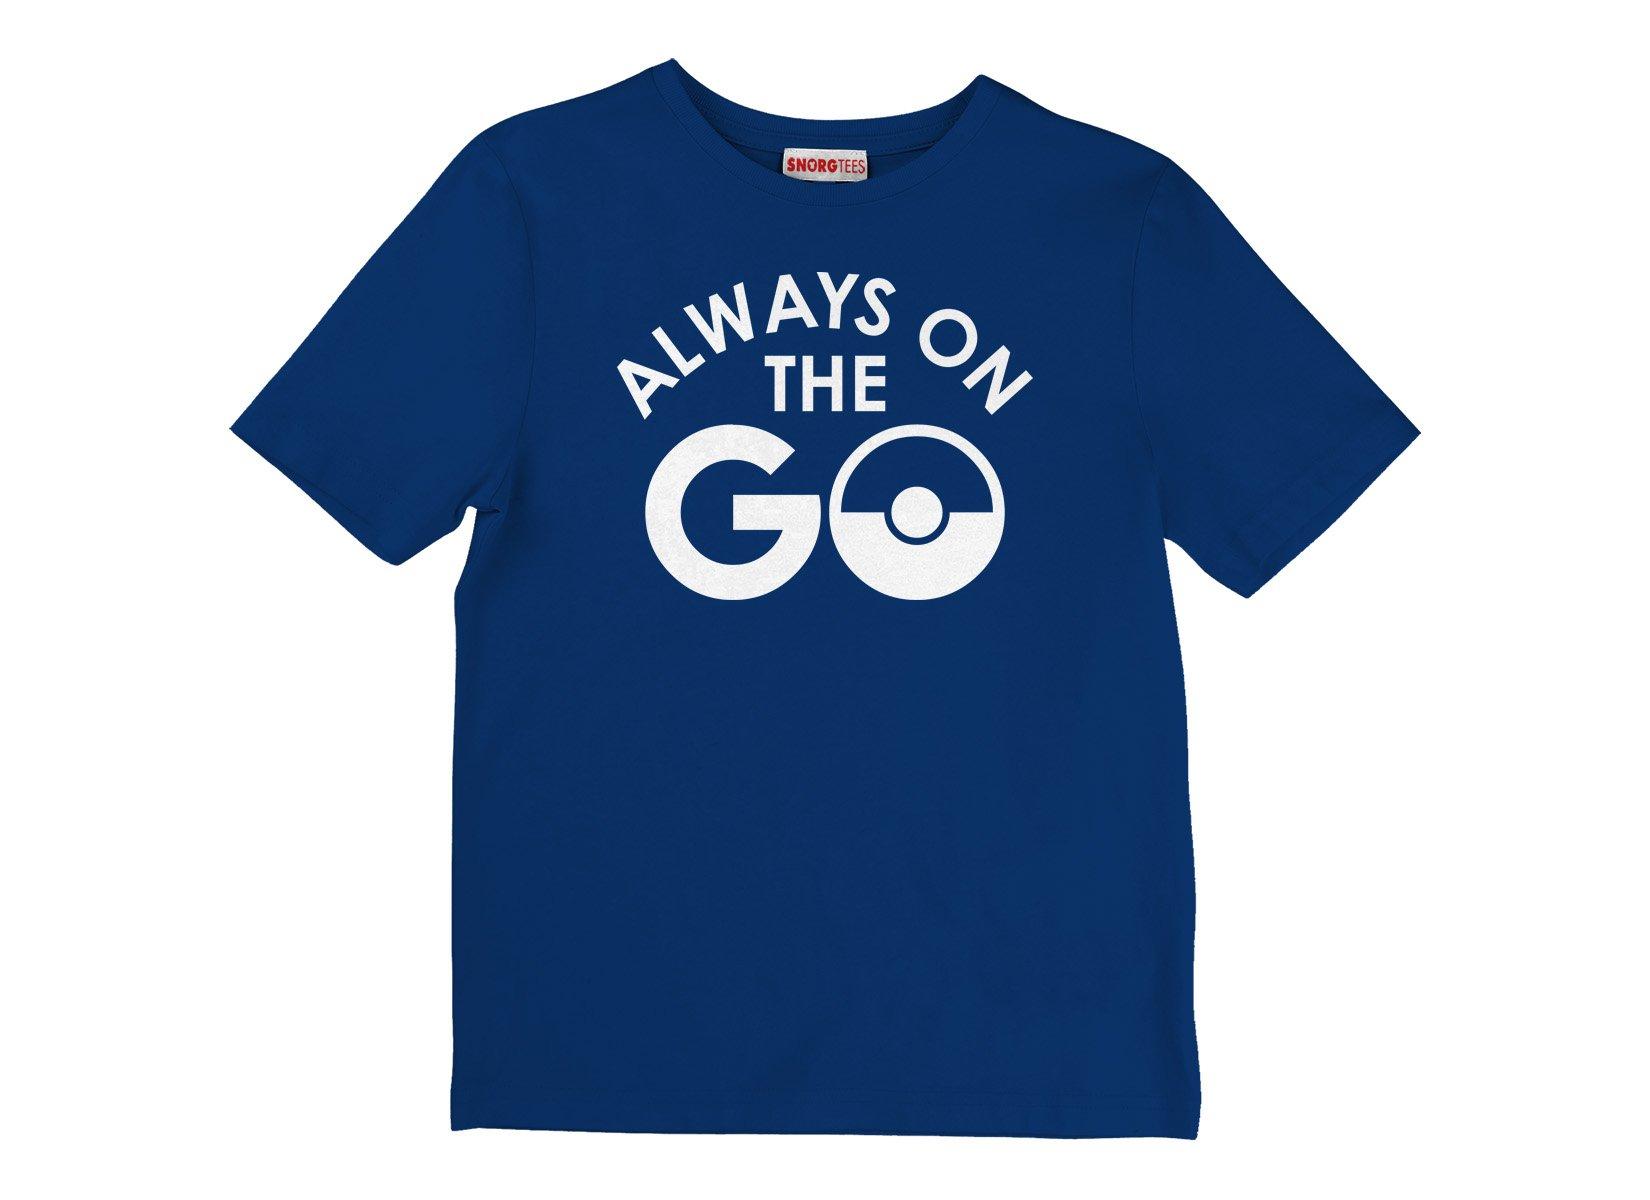 Pokemon Go Always on the Go T Shirt Image2